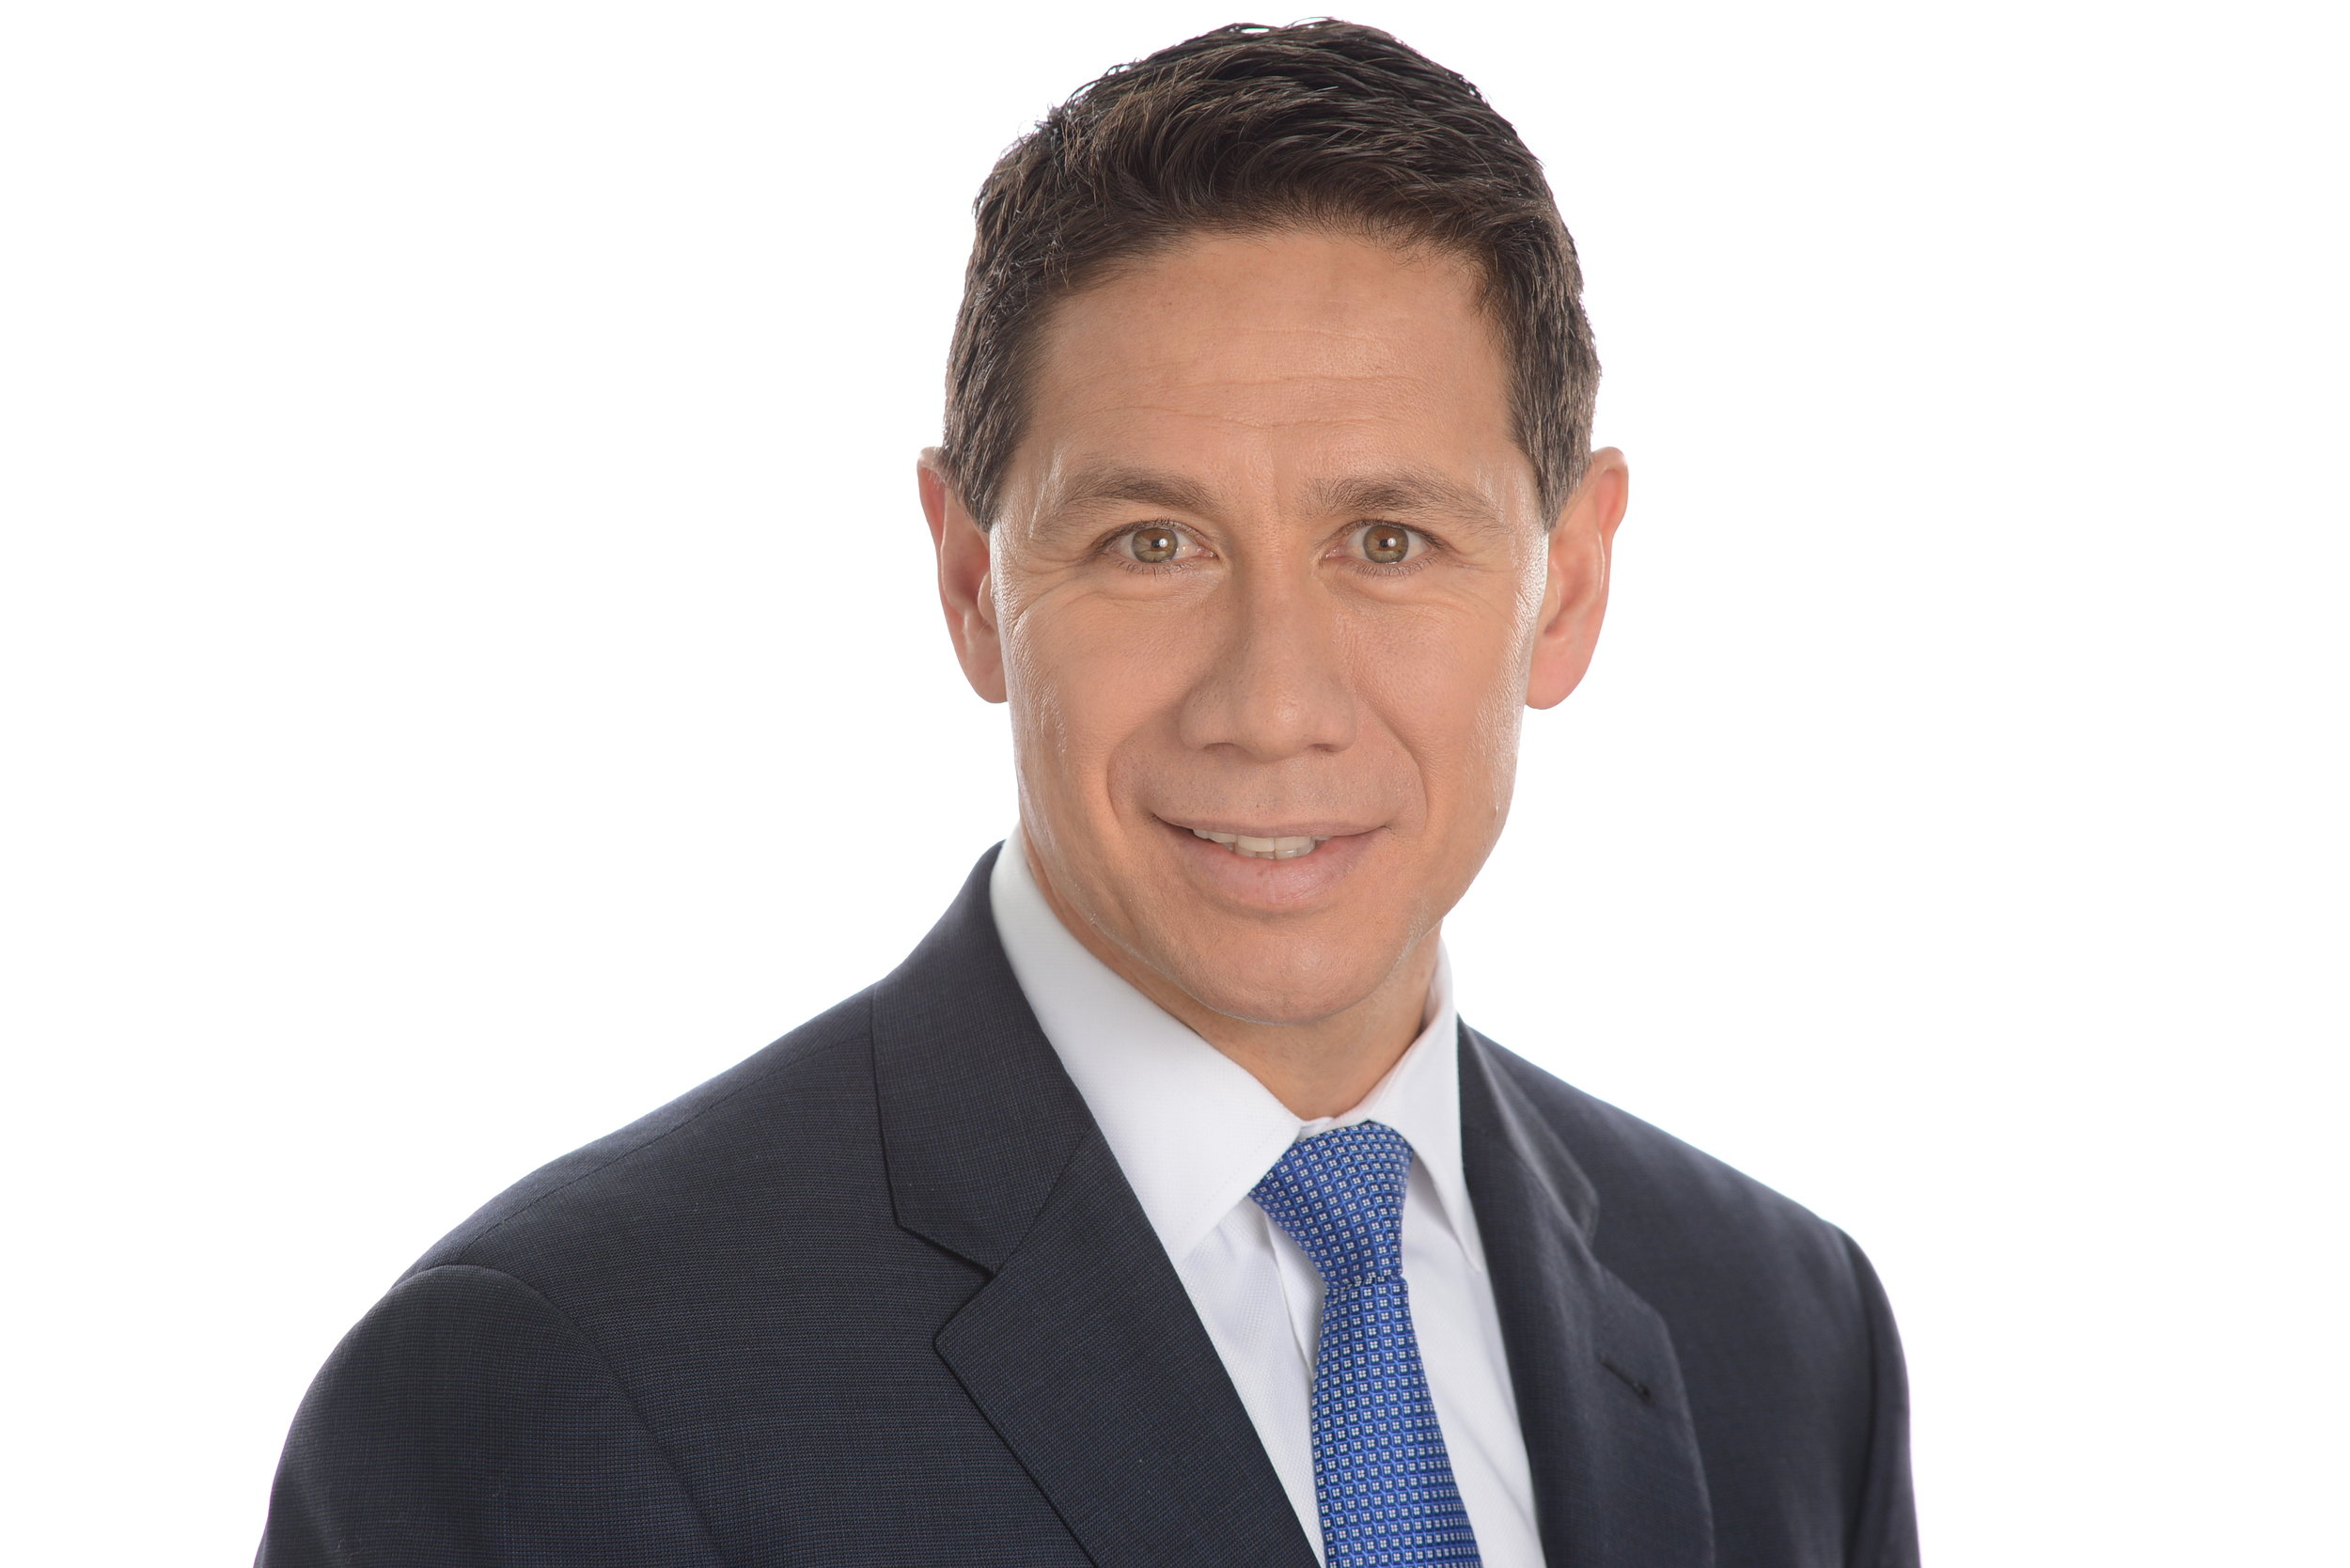 Tony Sanchez - VP, Customer Experience @ Comcast